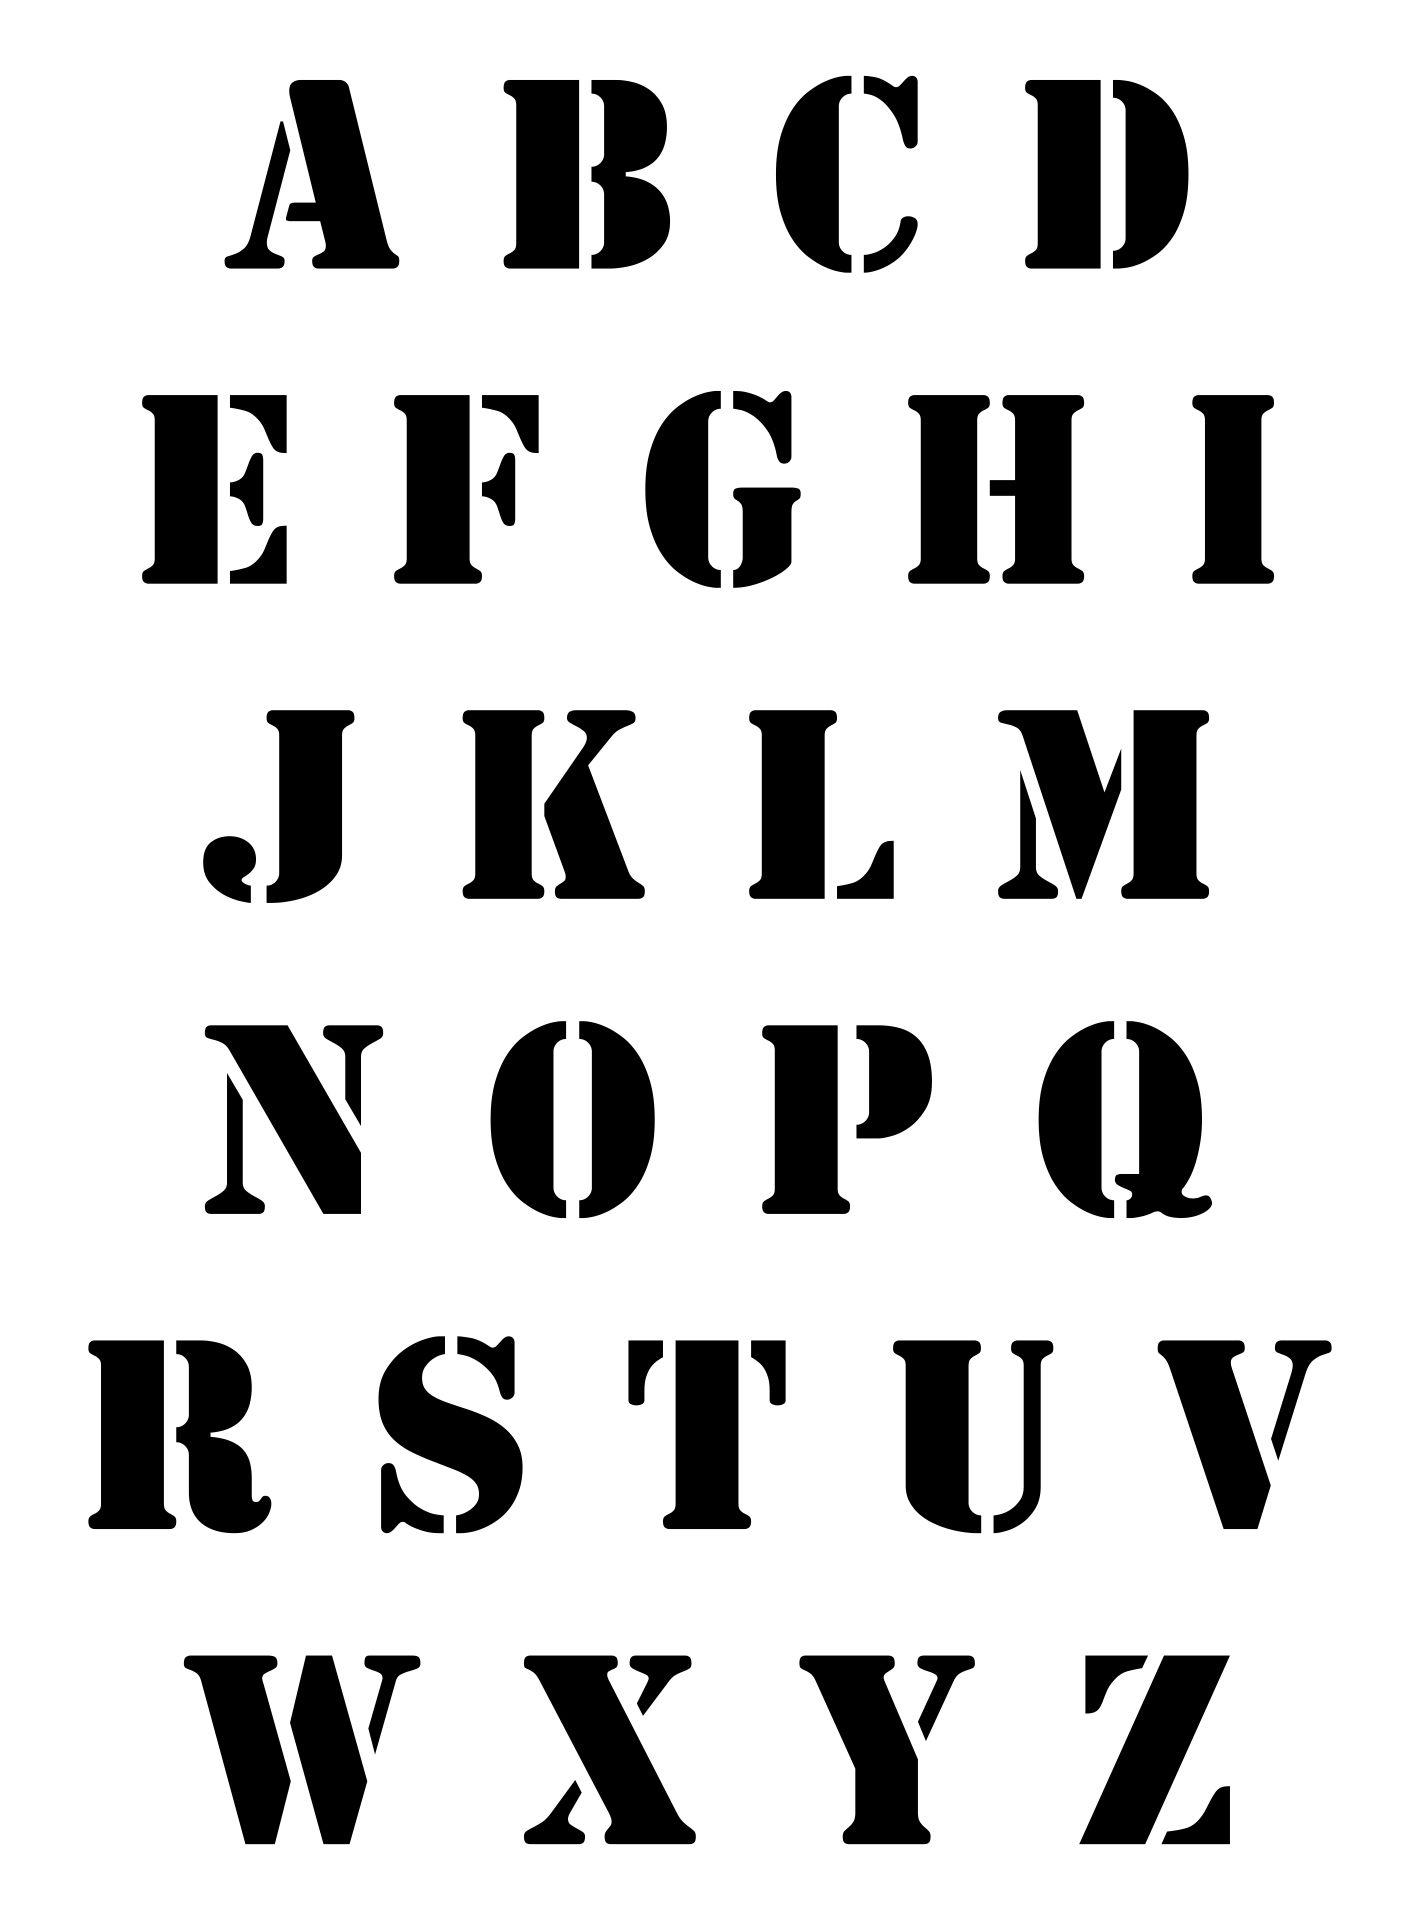 Printable Letter Stencil Patterns